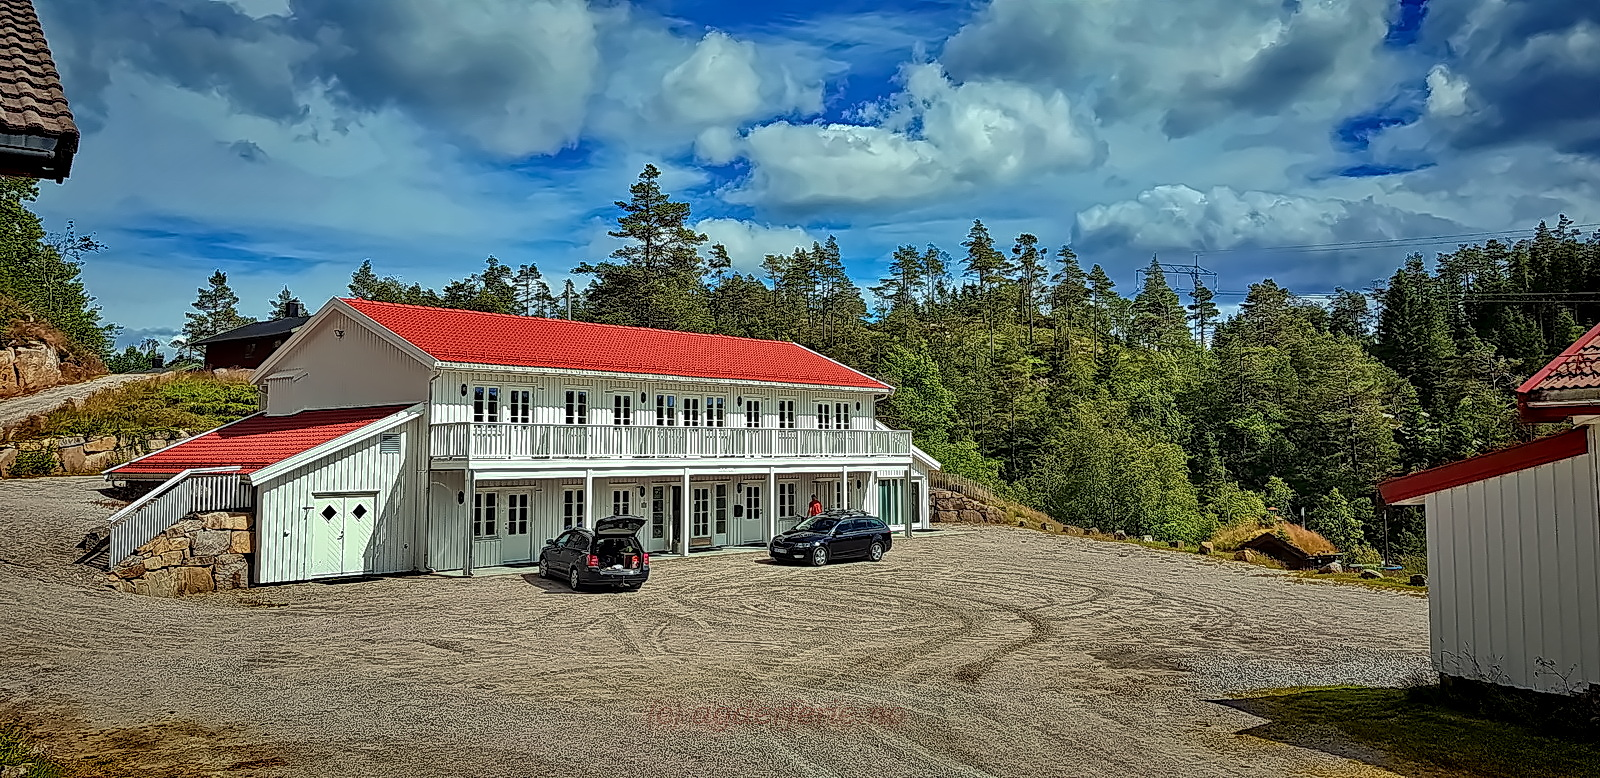 201 Undeland gård, Kvås, Lyngdal